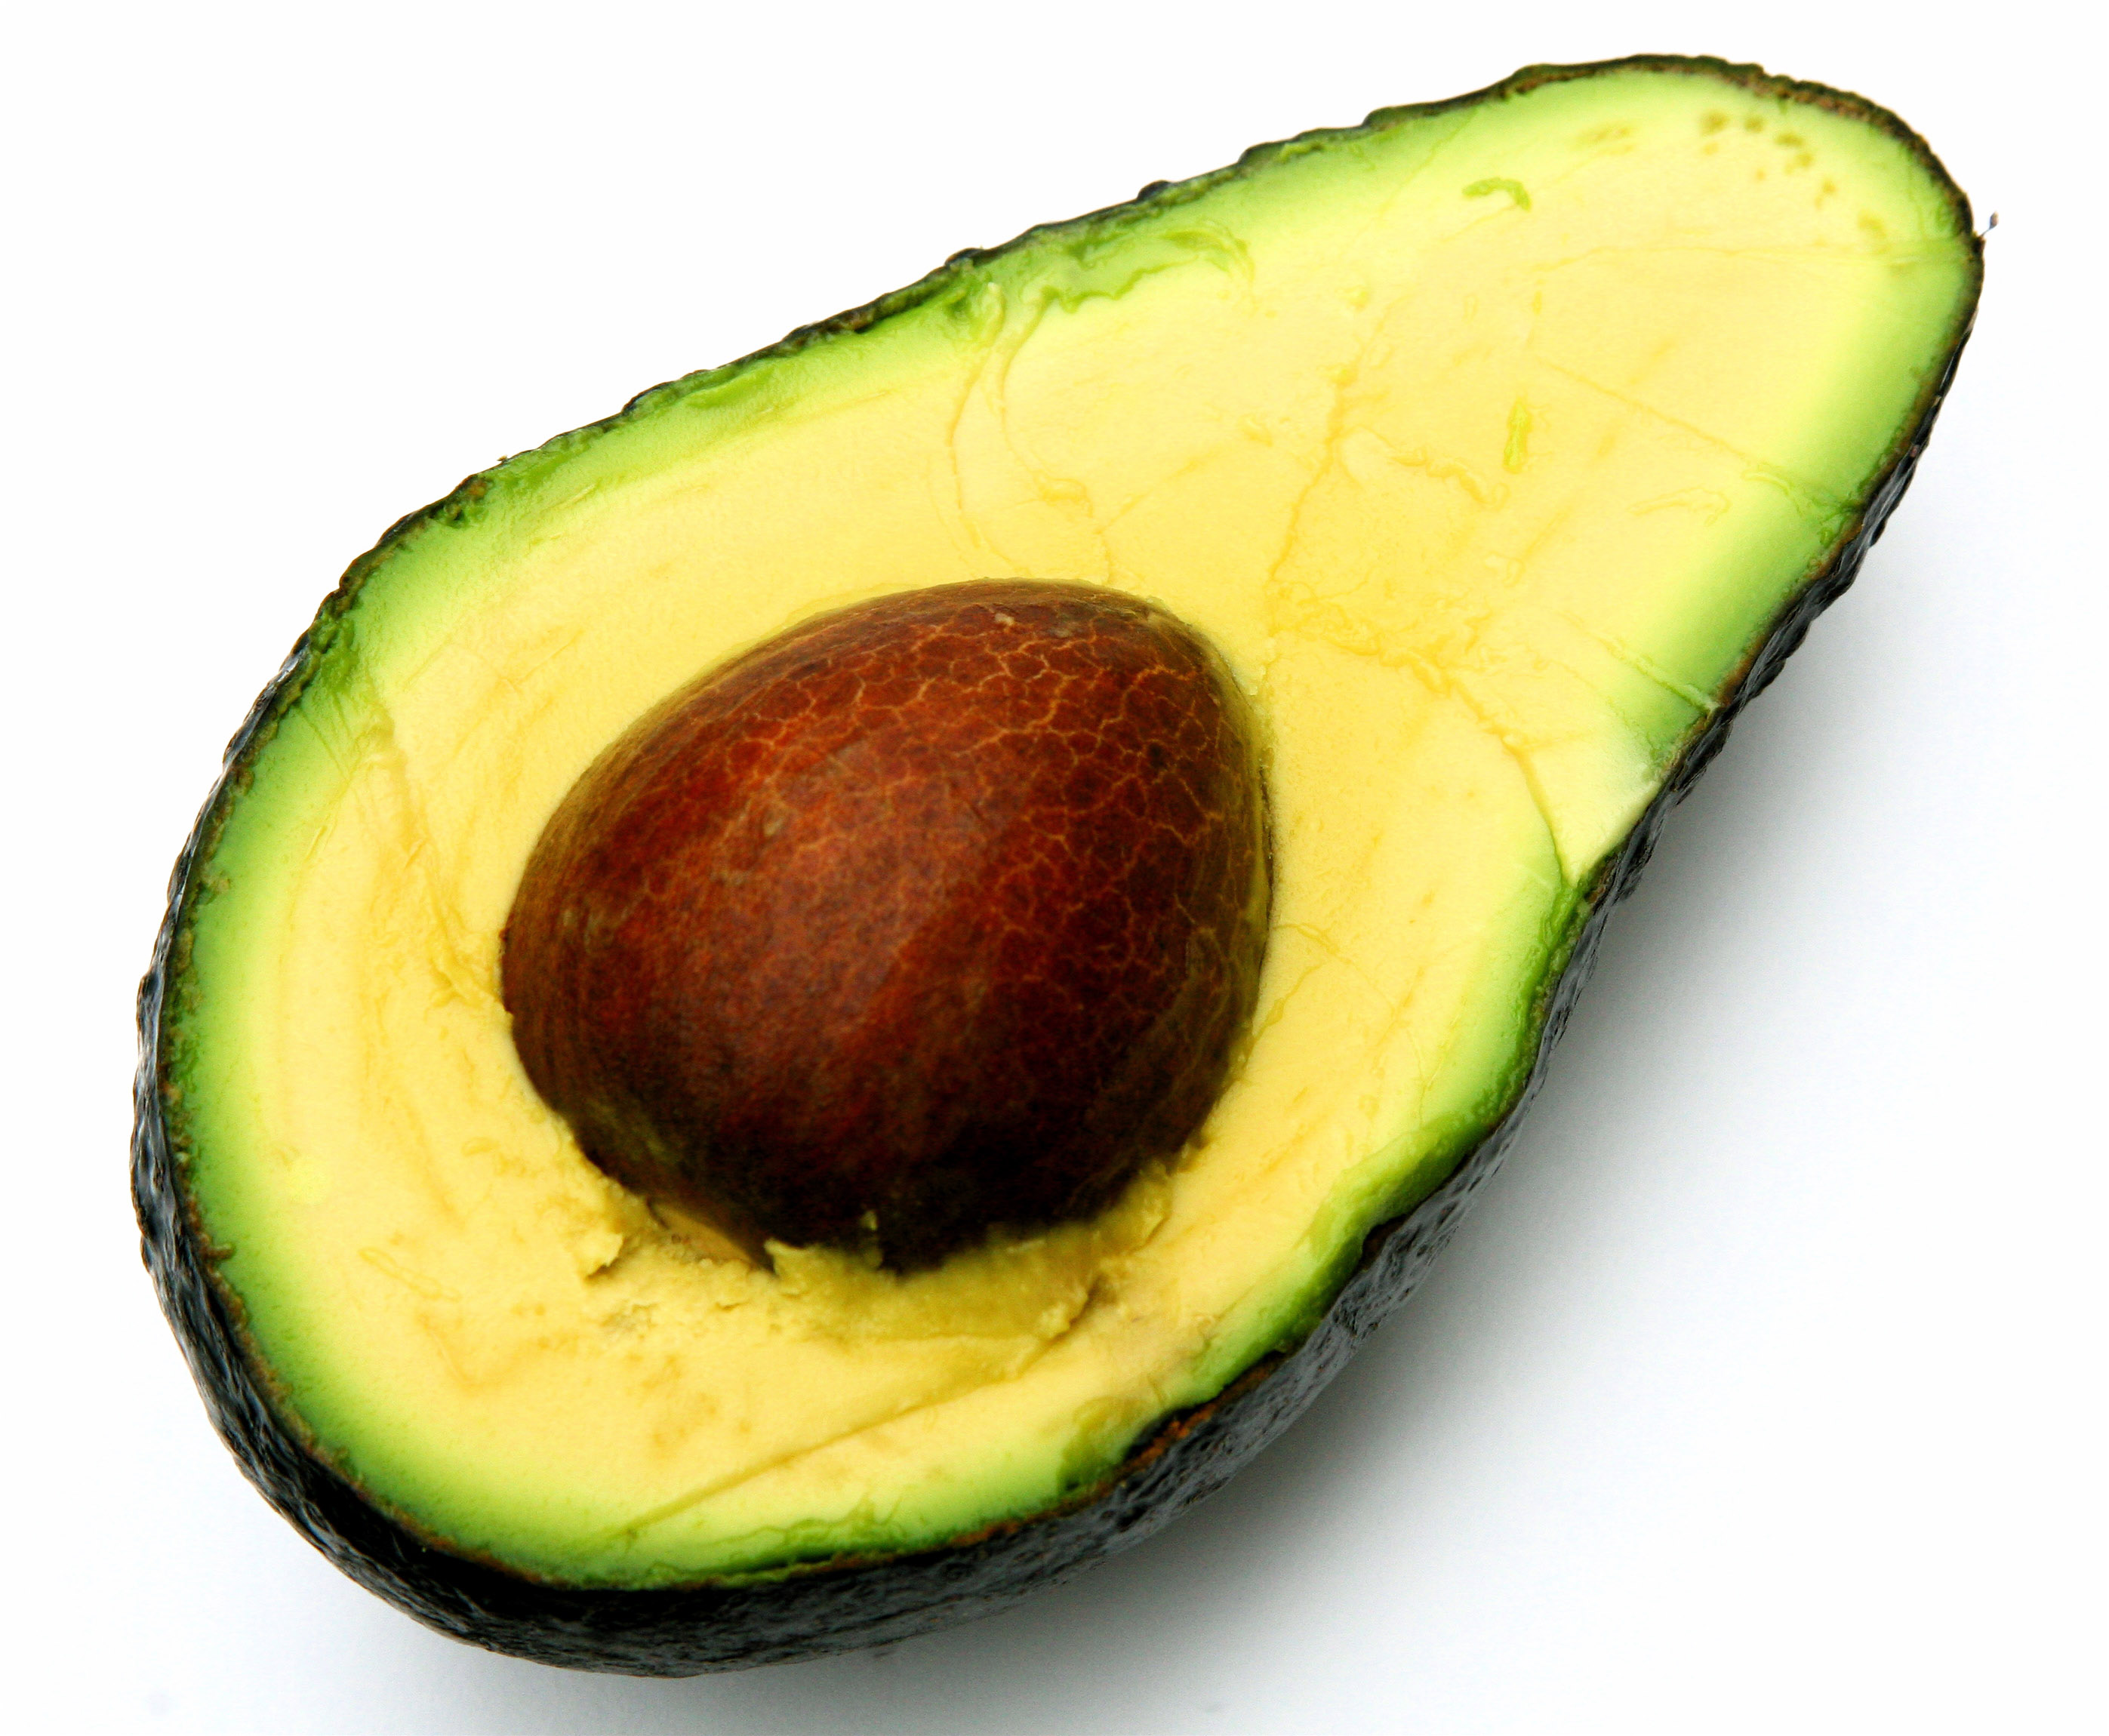 Can I give my dog avocado?